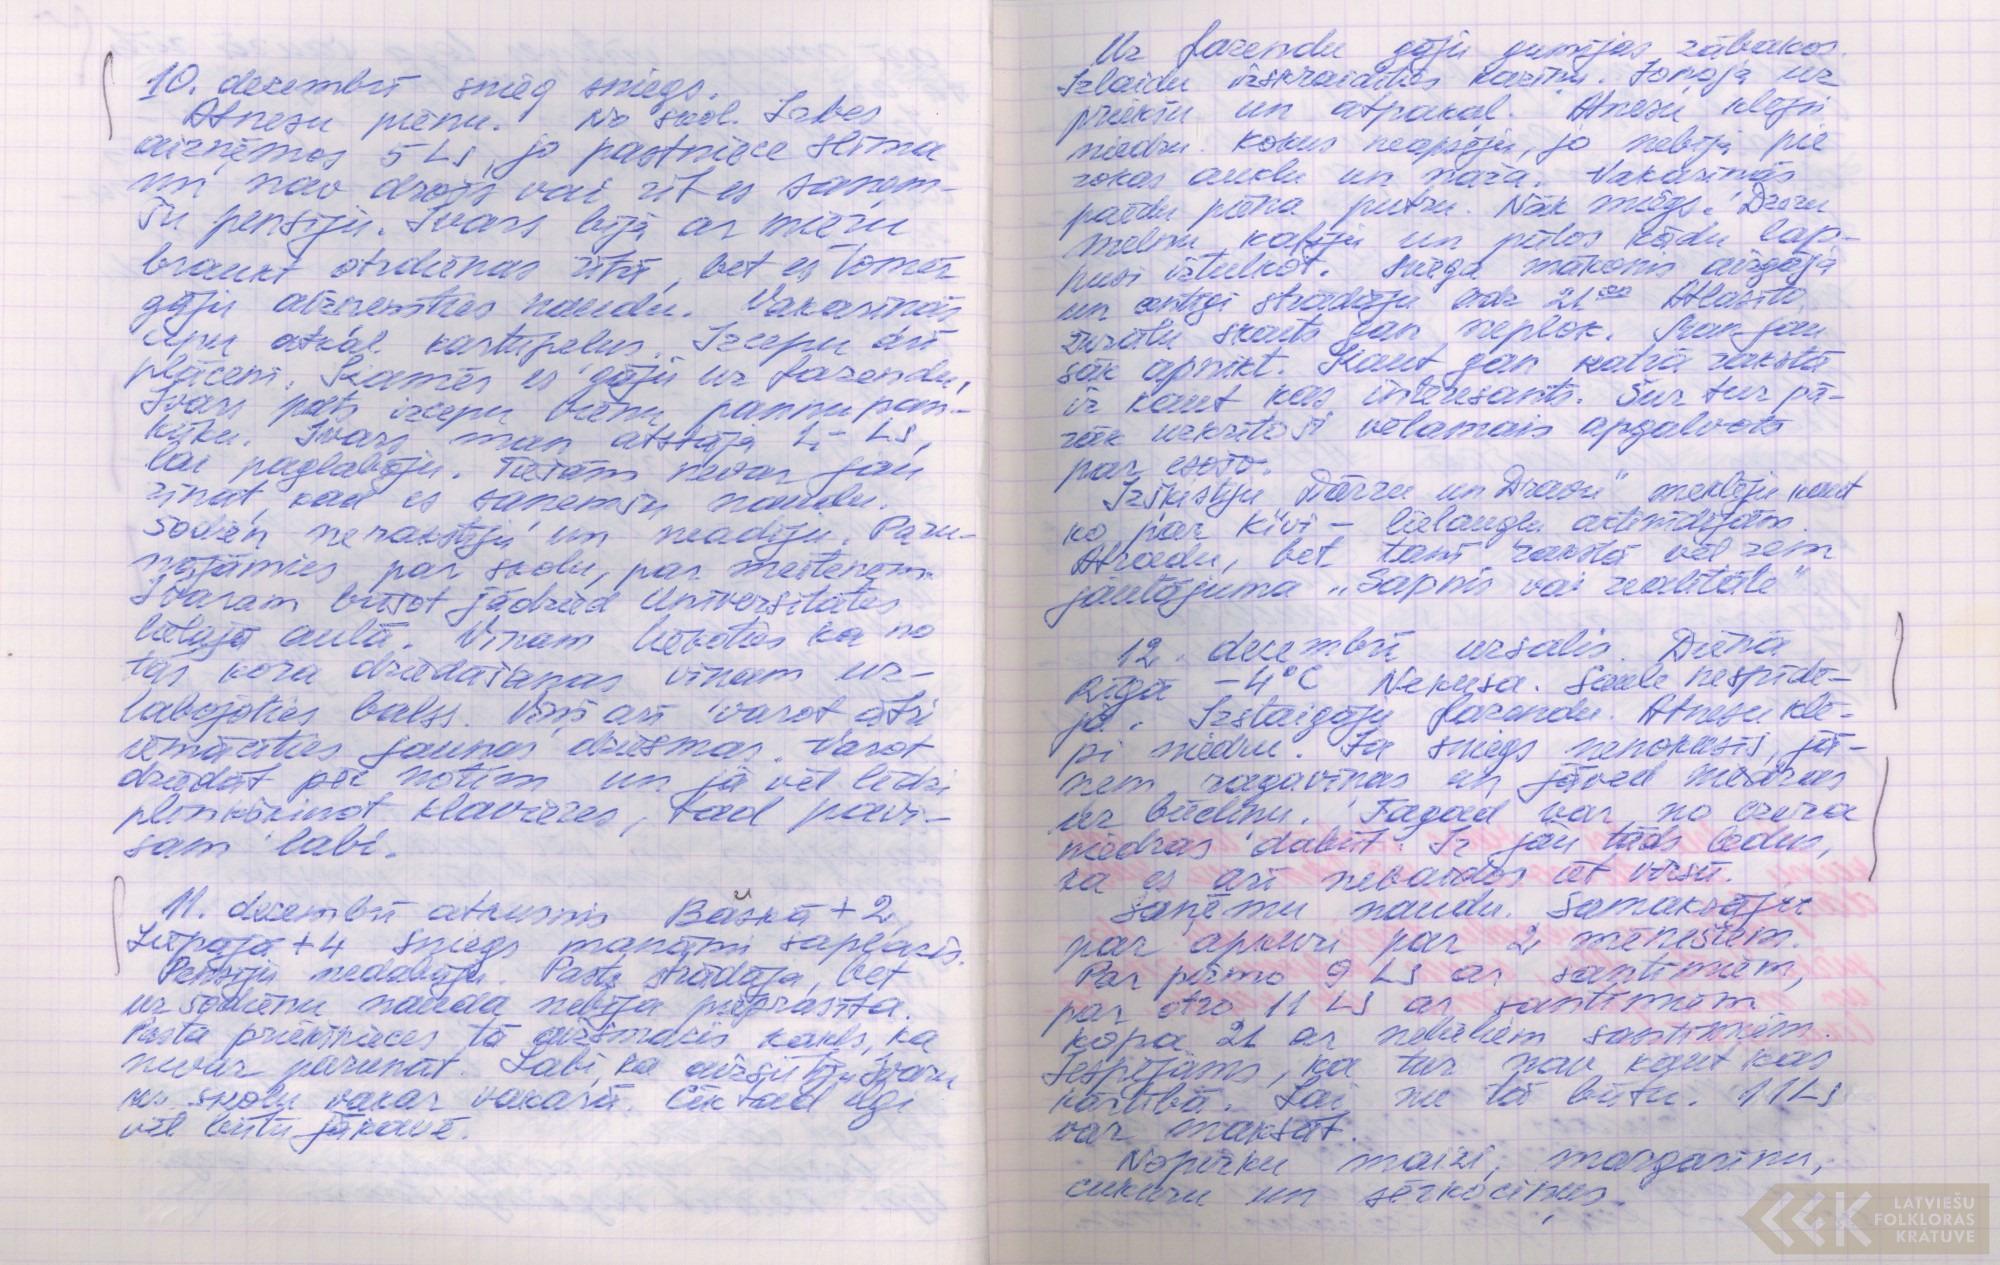 Ak161-Ligitas-Vucenas-dienasgramatas-35-0033